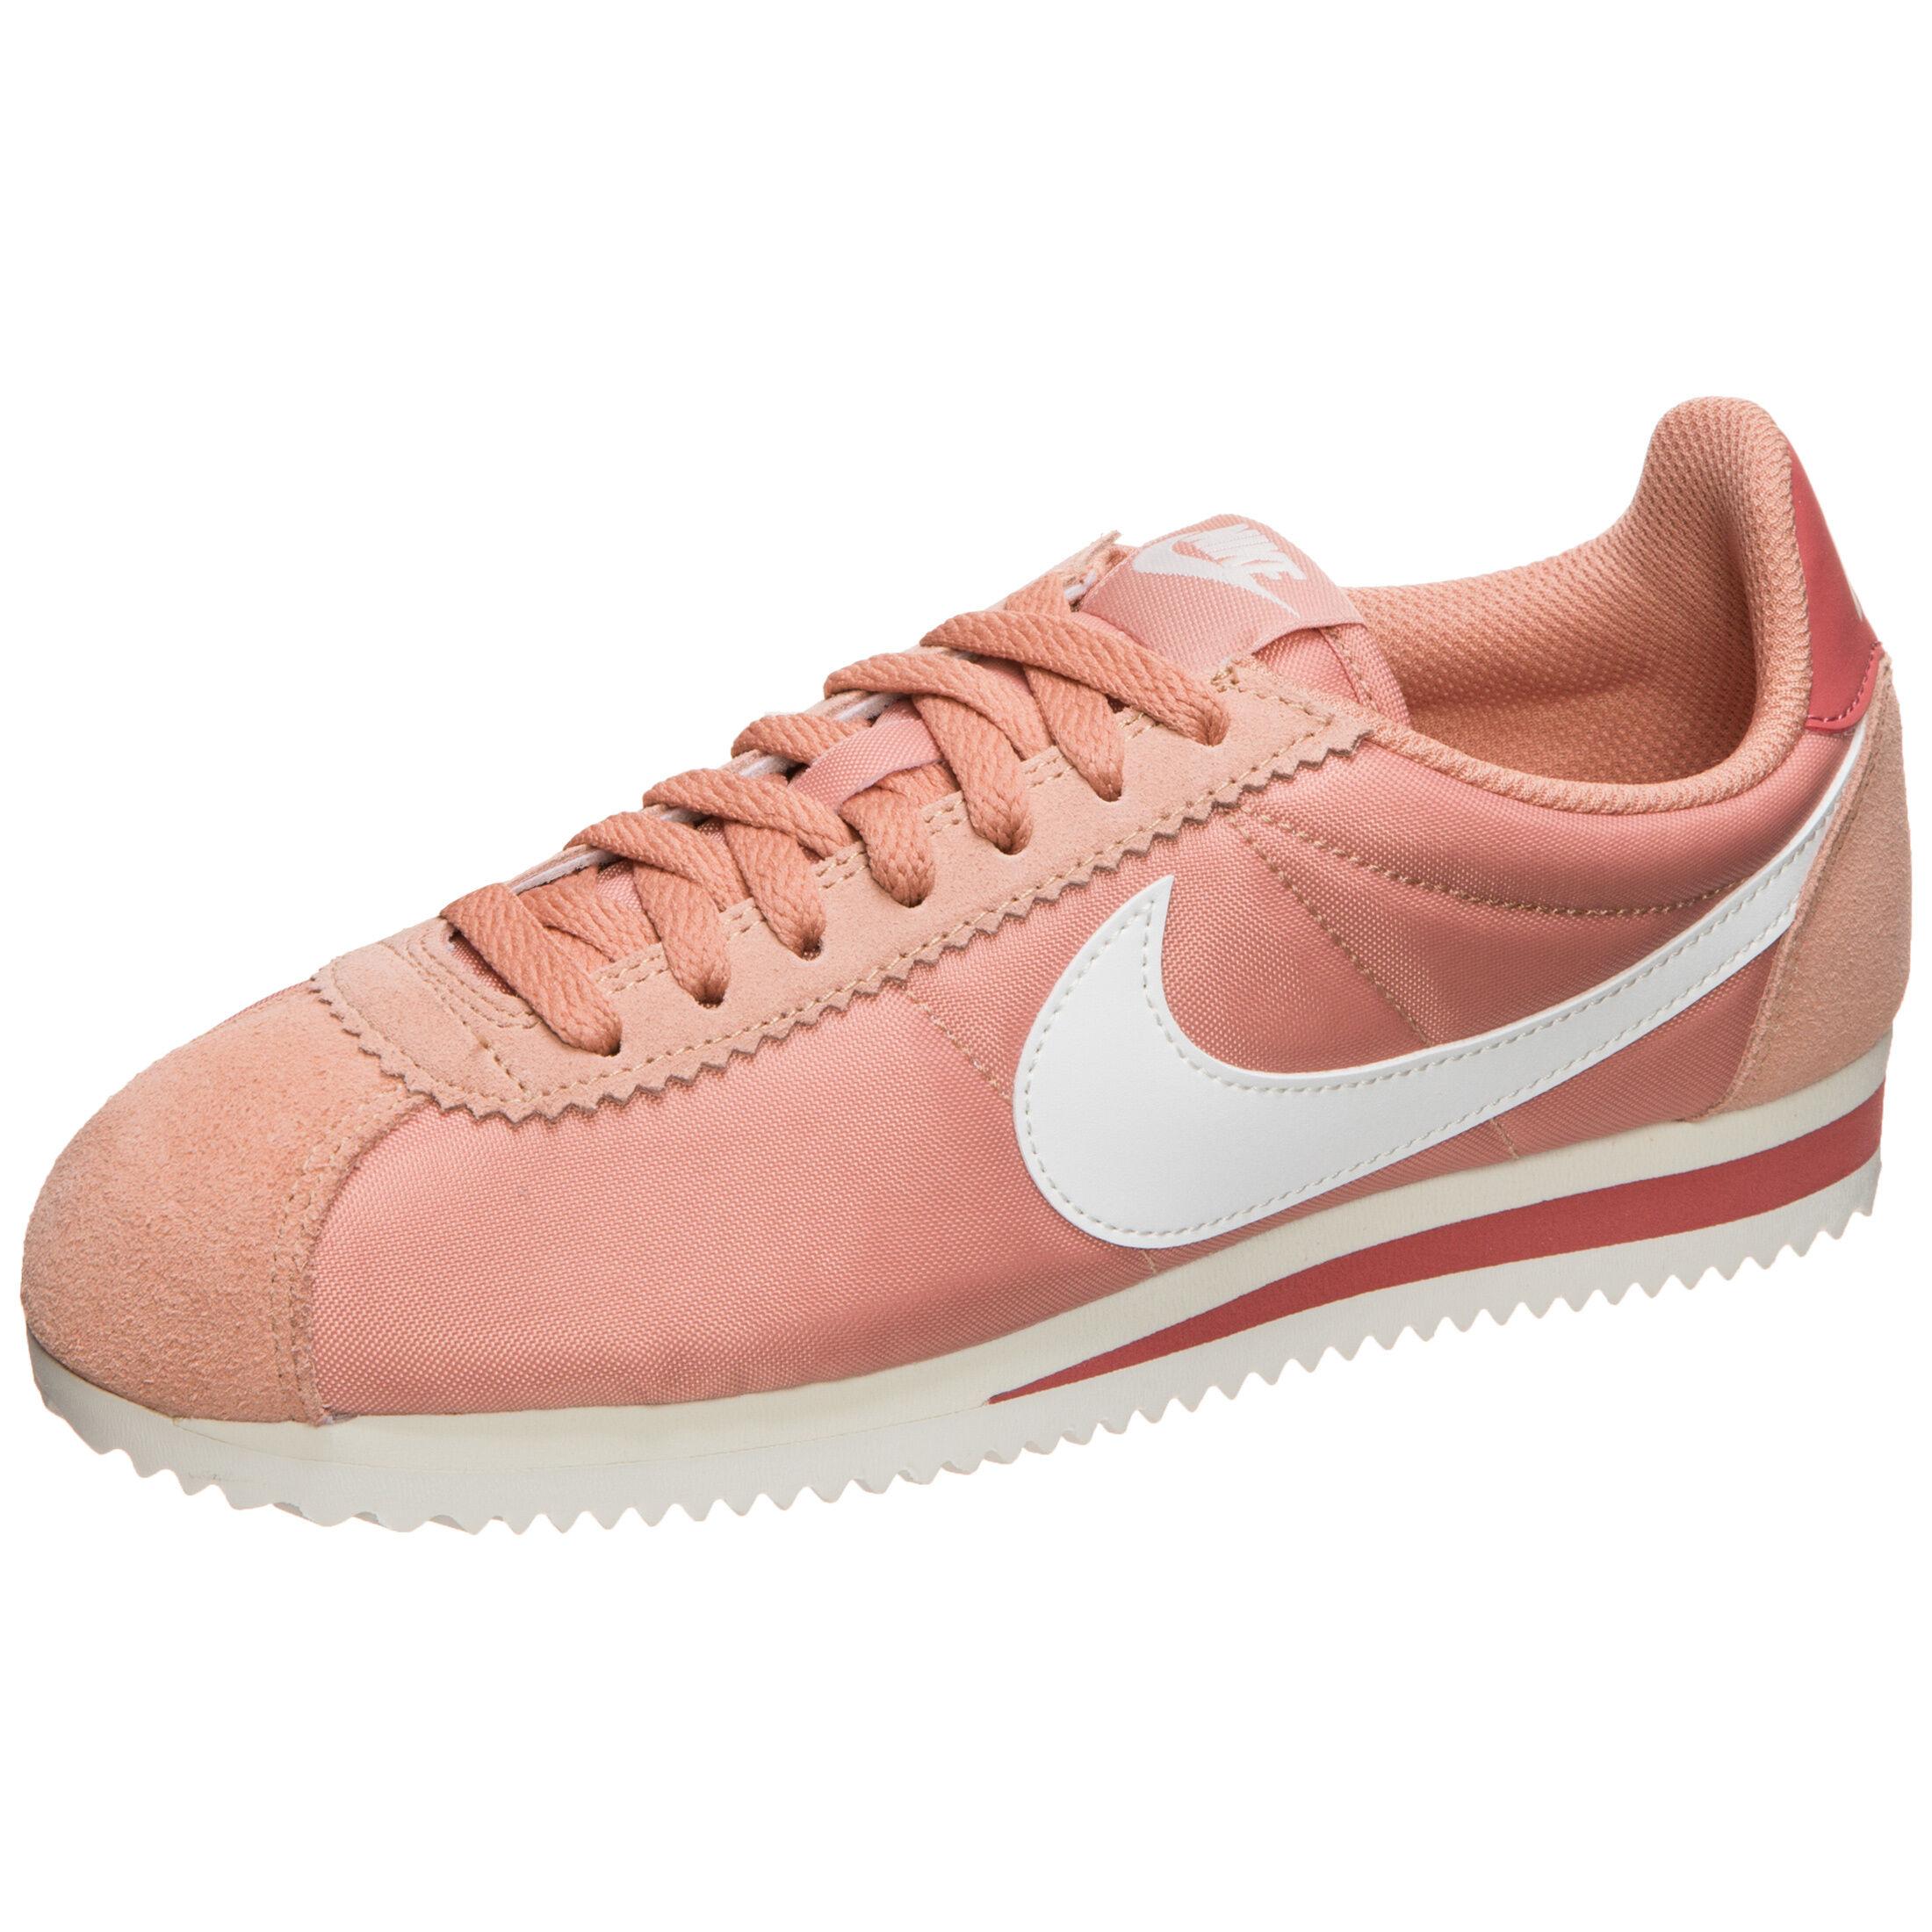 OUTFITTER Nike CortezSneaker bei Shop Lifestyle 0OkX8nwP